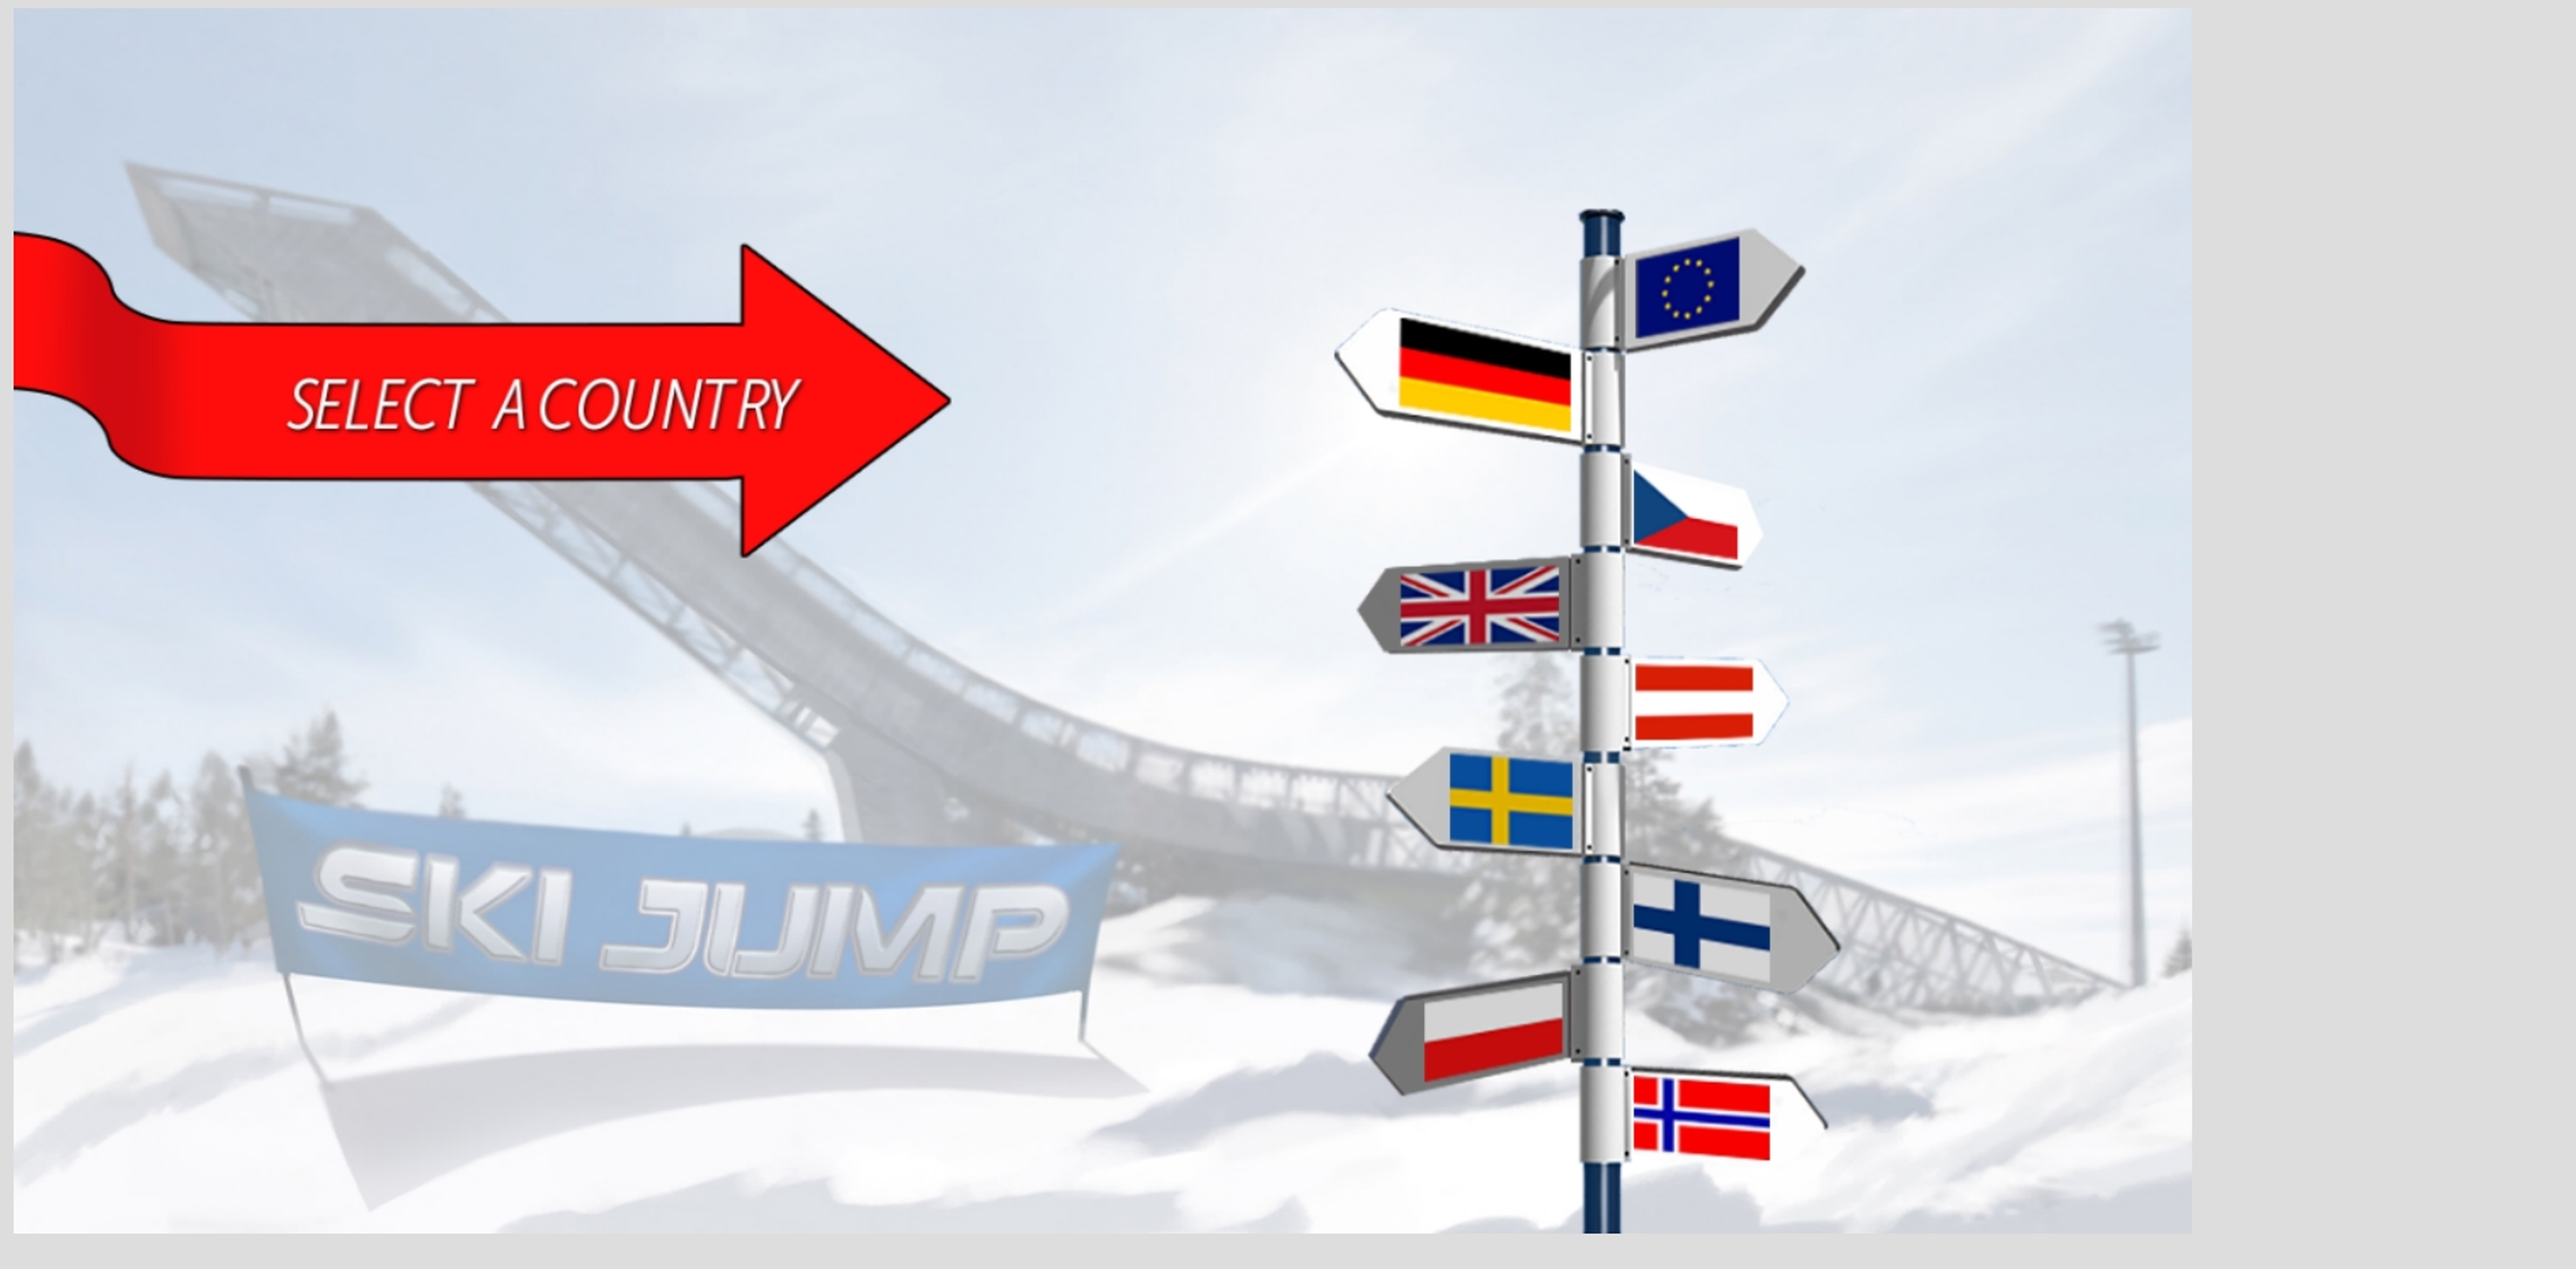 Play Ski Jump Slot Machine Free With No Download